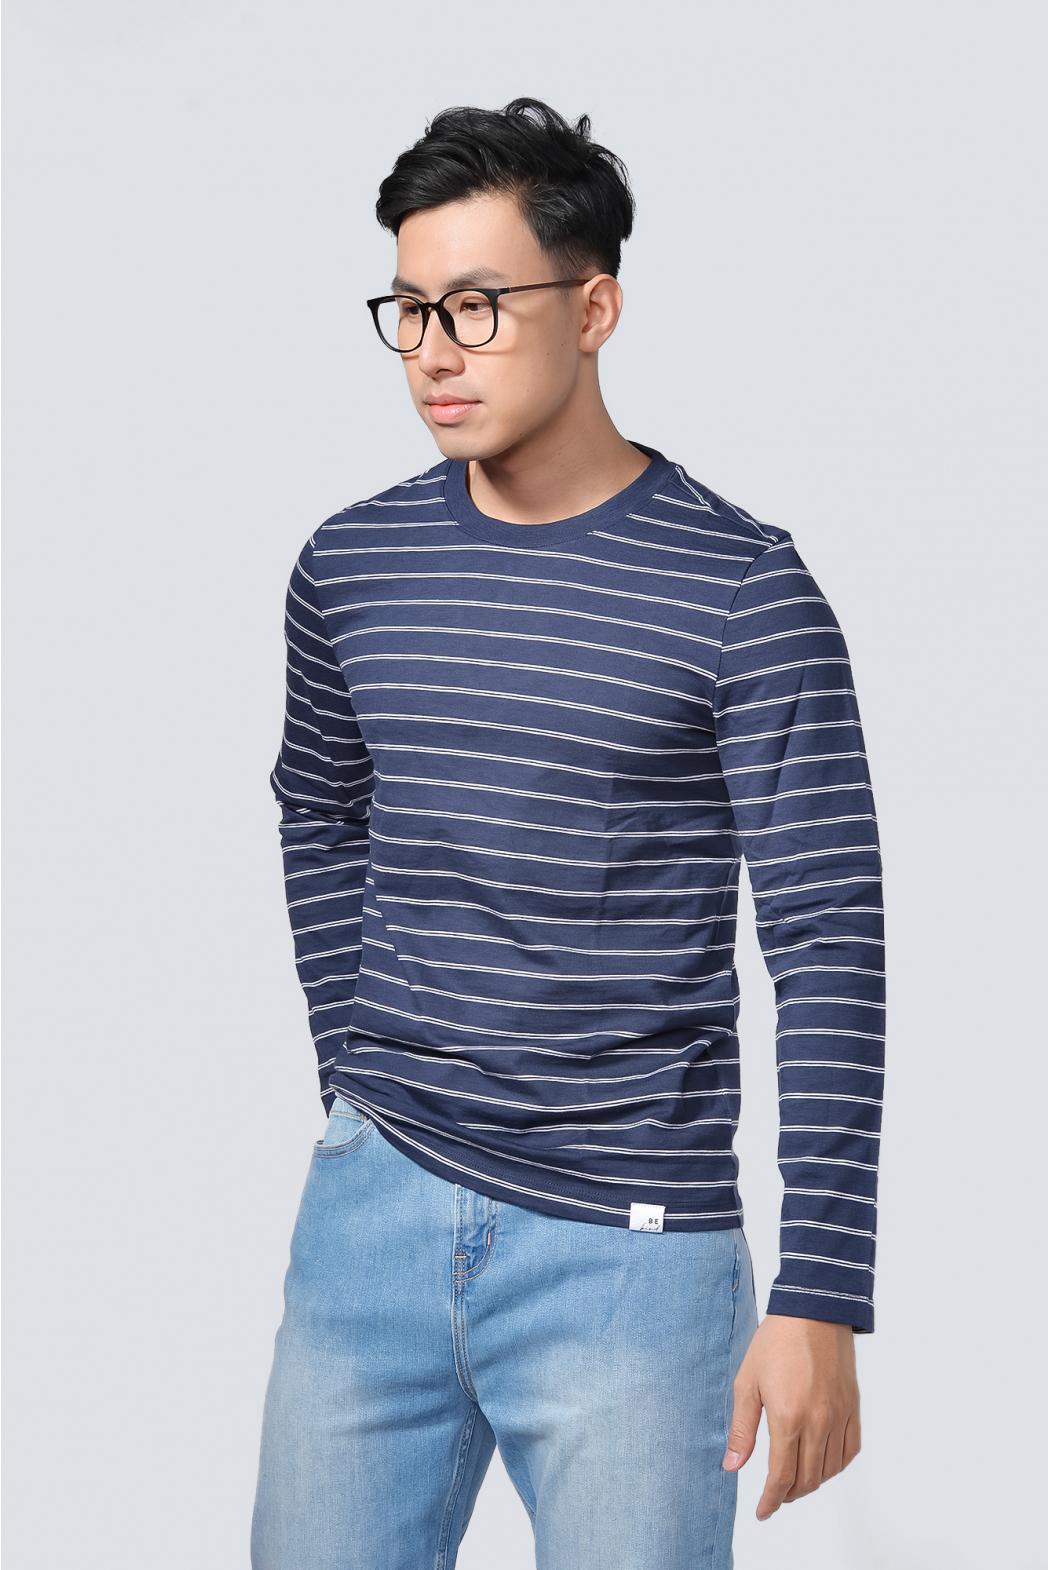 Áo thun tay dài, Stripe. FITTED form - 10F20TSH013